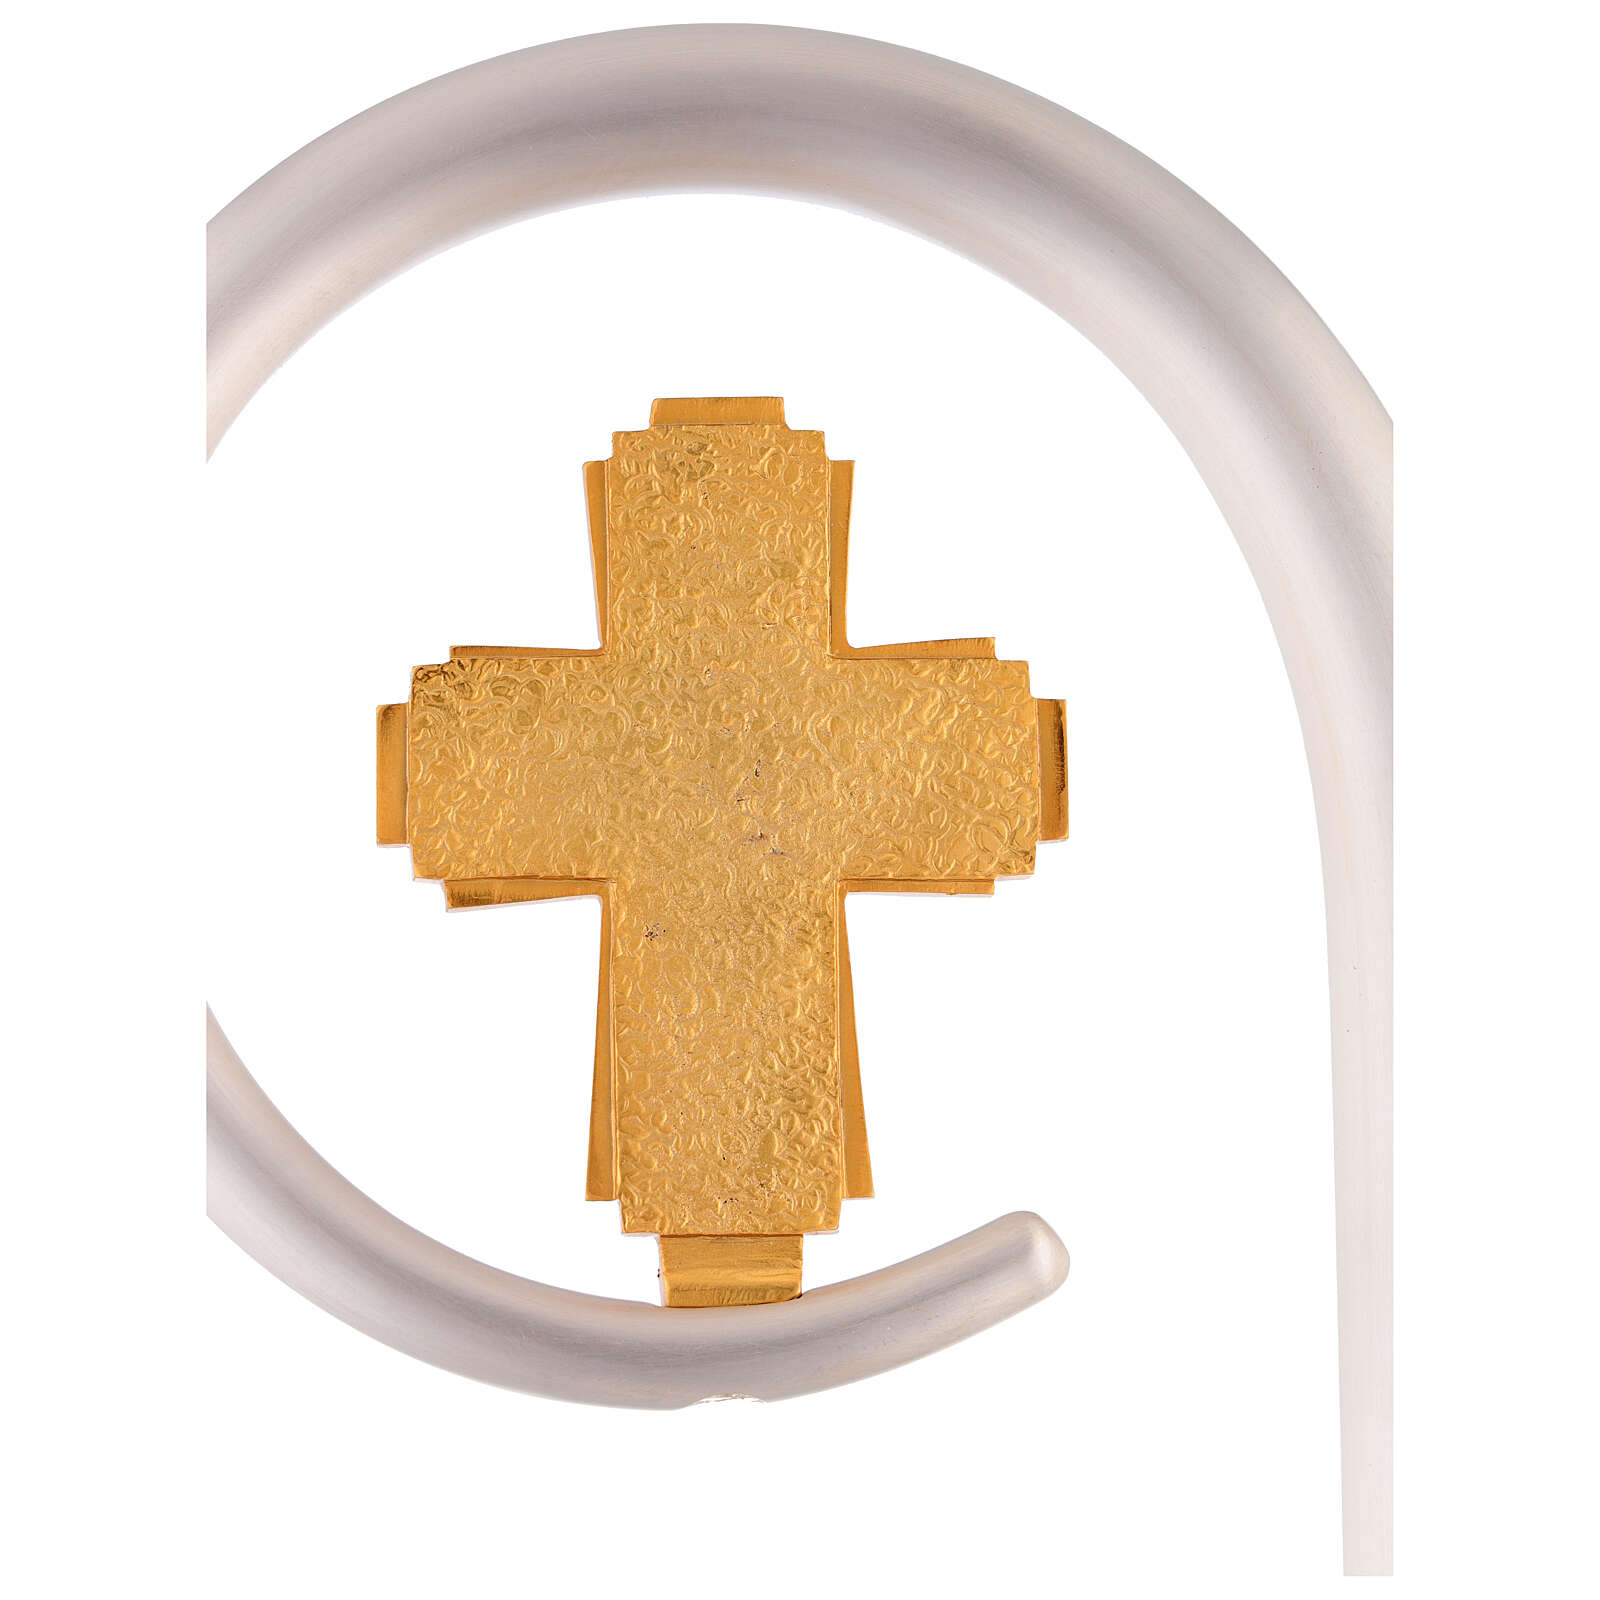 Pastoral episcopal vasija óleo santo símbolo cruz 4 evangelistas h 180 cm 3